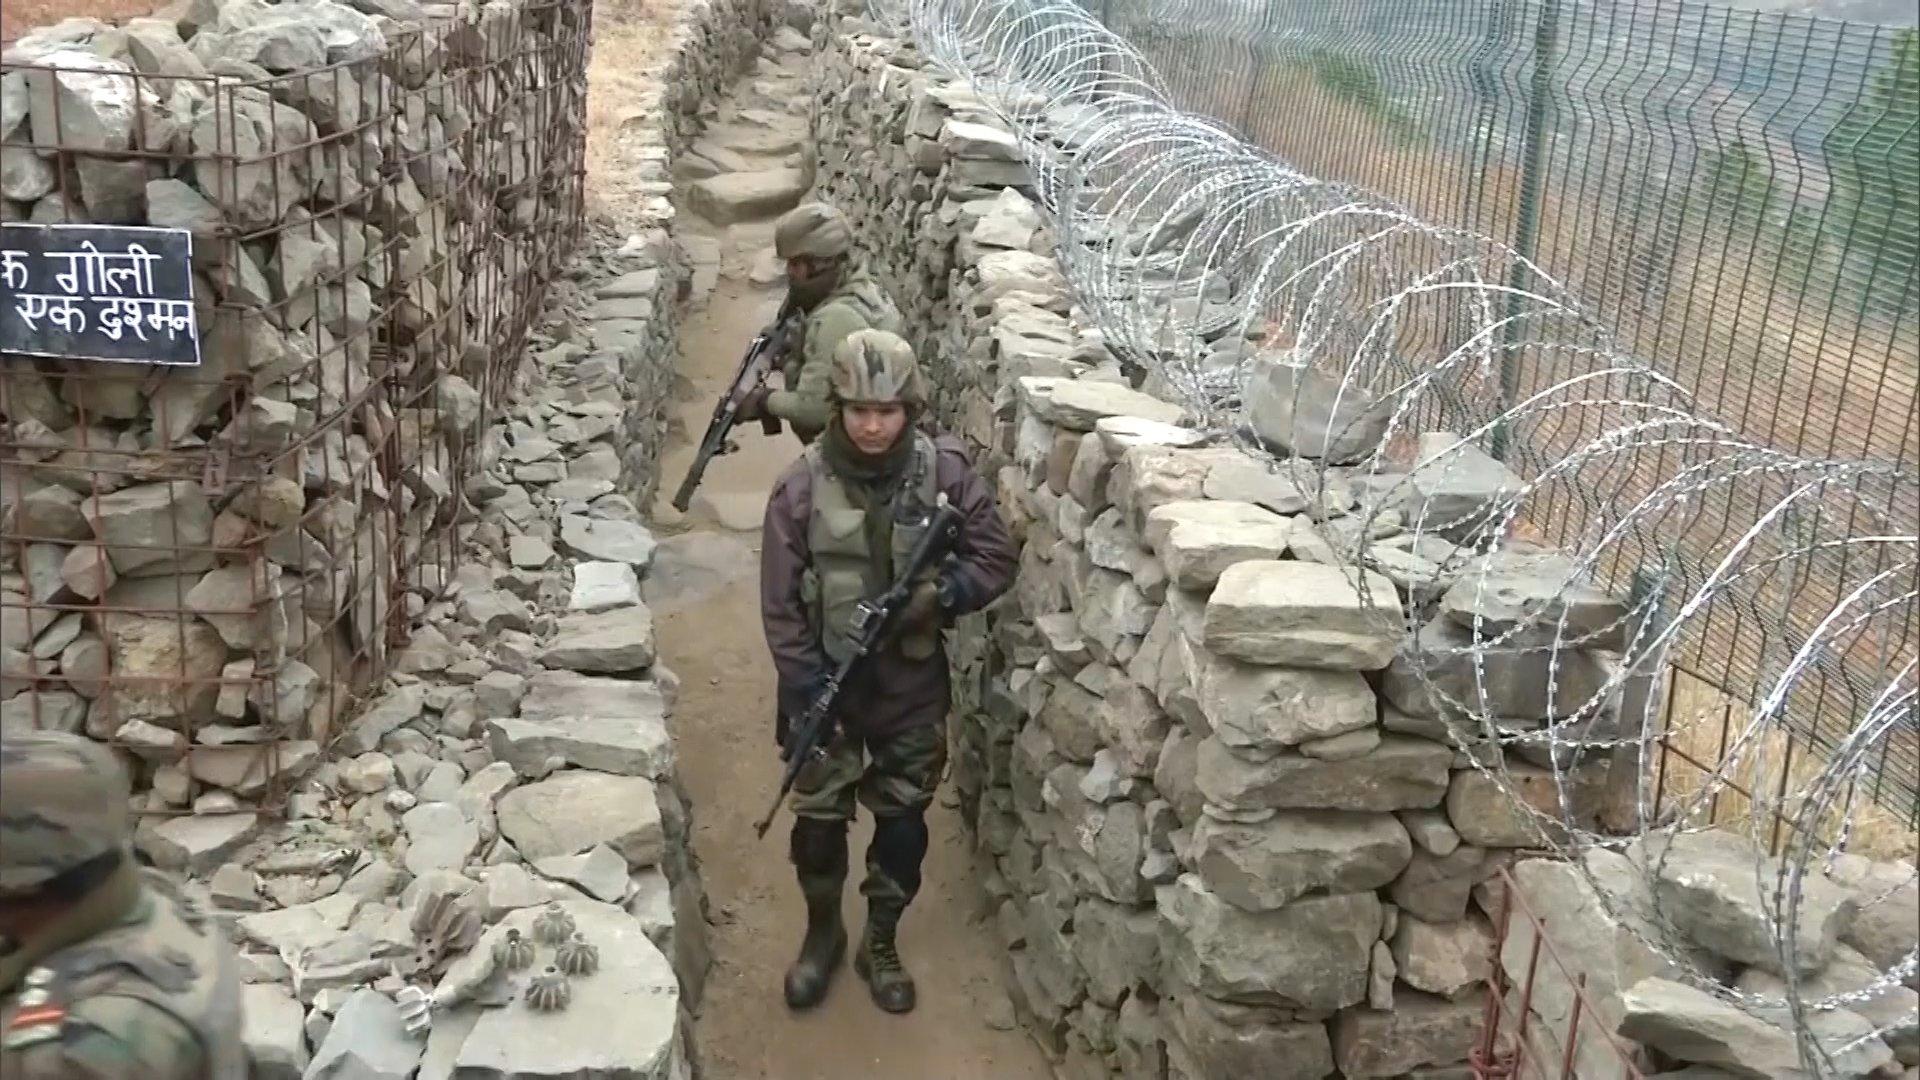 5e3fca9e0c02a_ani-060120-poonch-forward-post-of-loc-near-balakot-good-army-security-shots.jpg